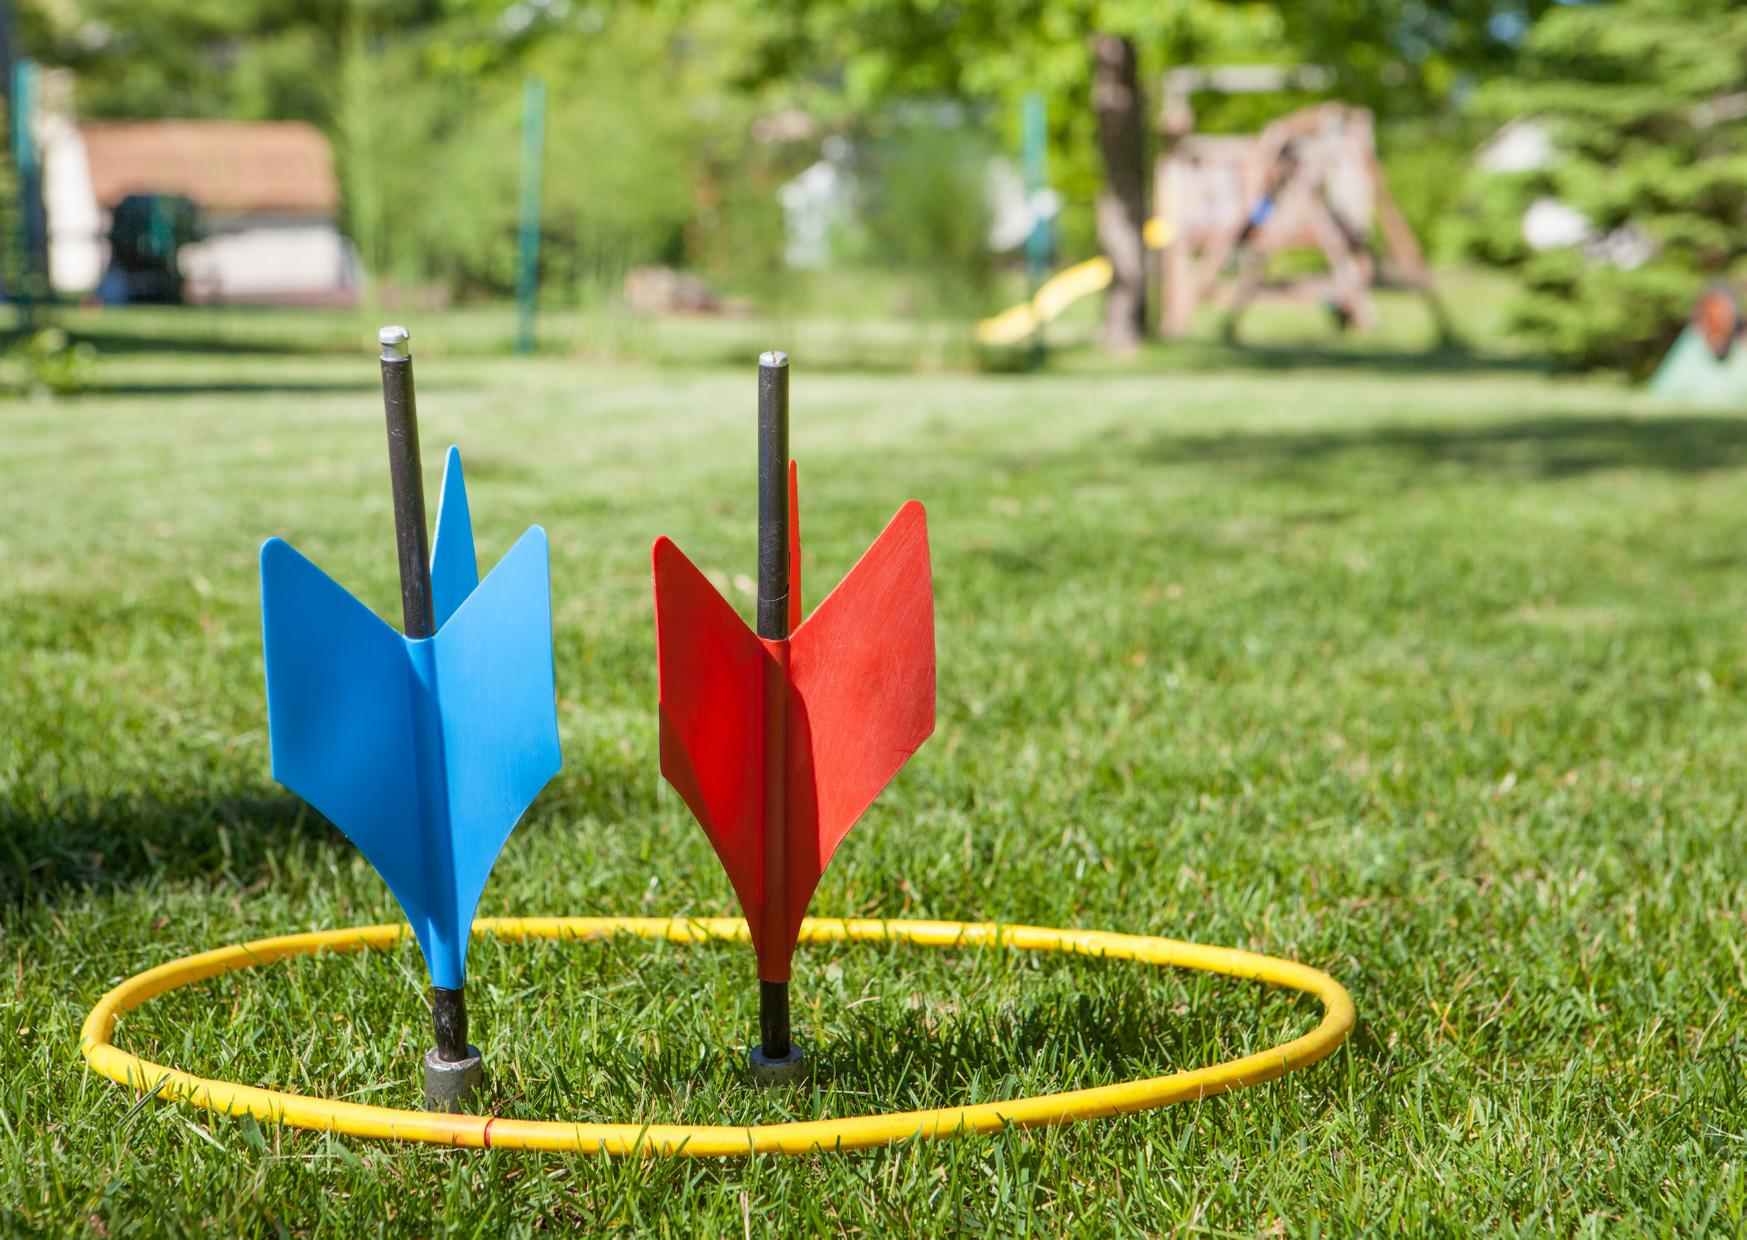 Photo of Outdoor Lawn Darts